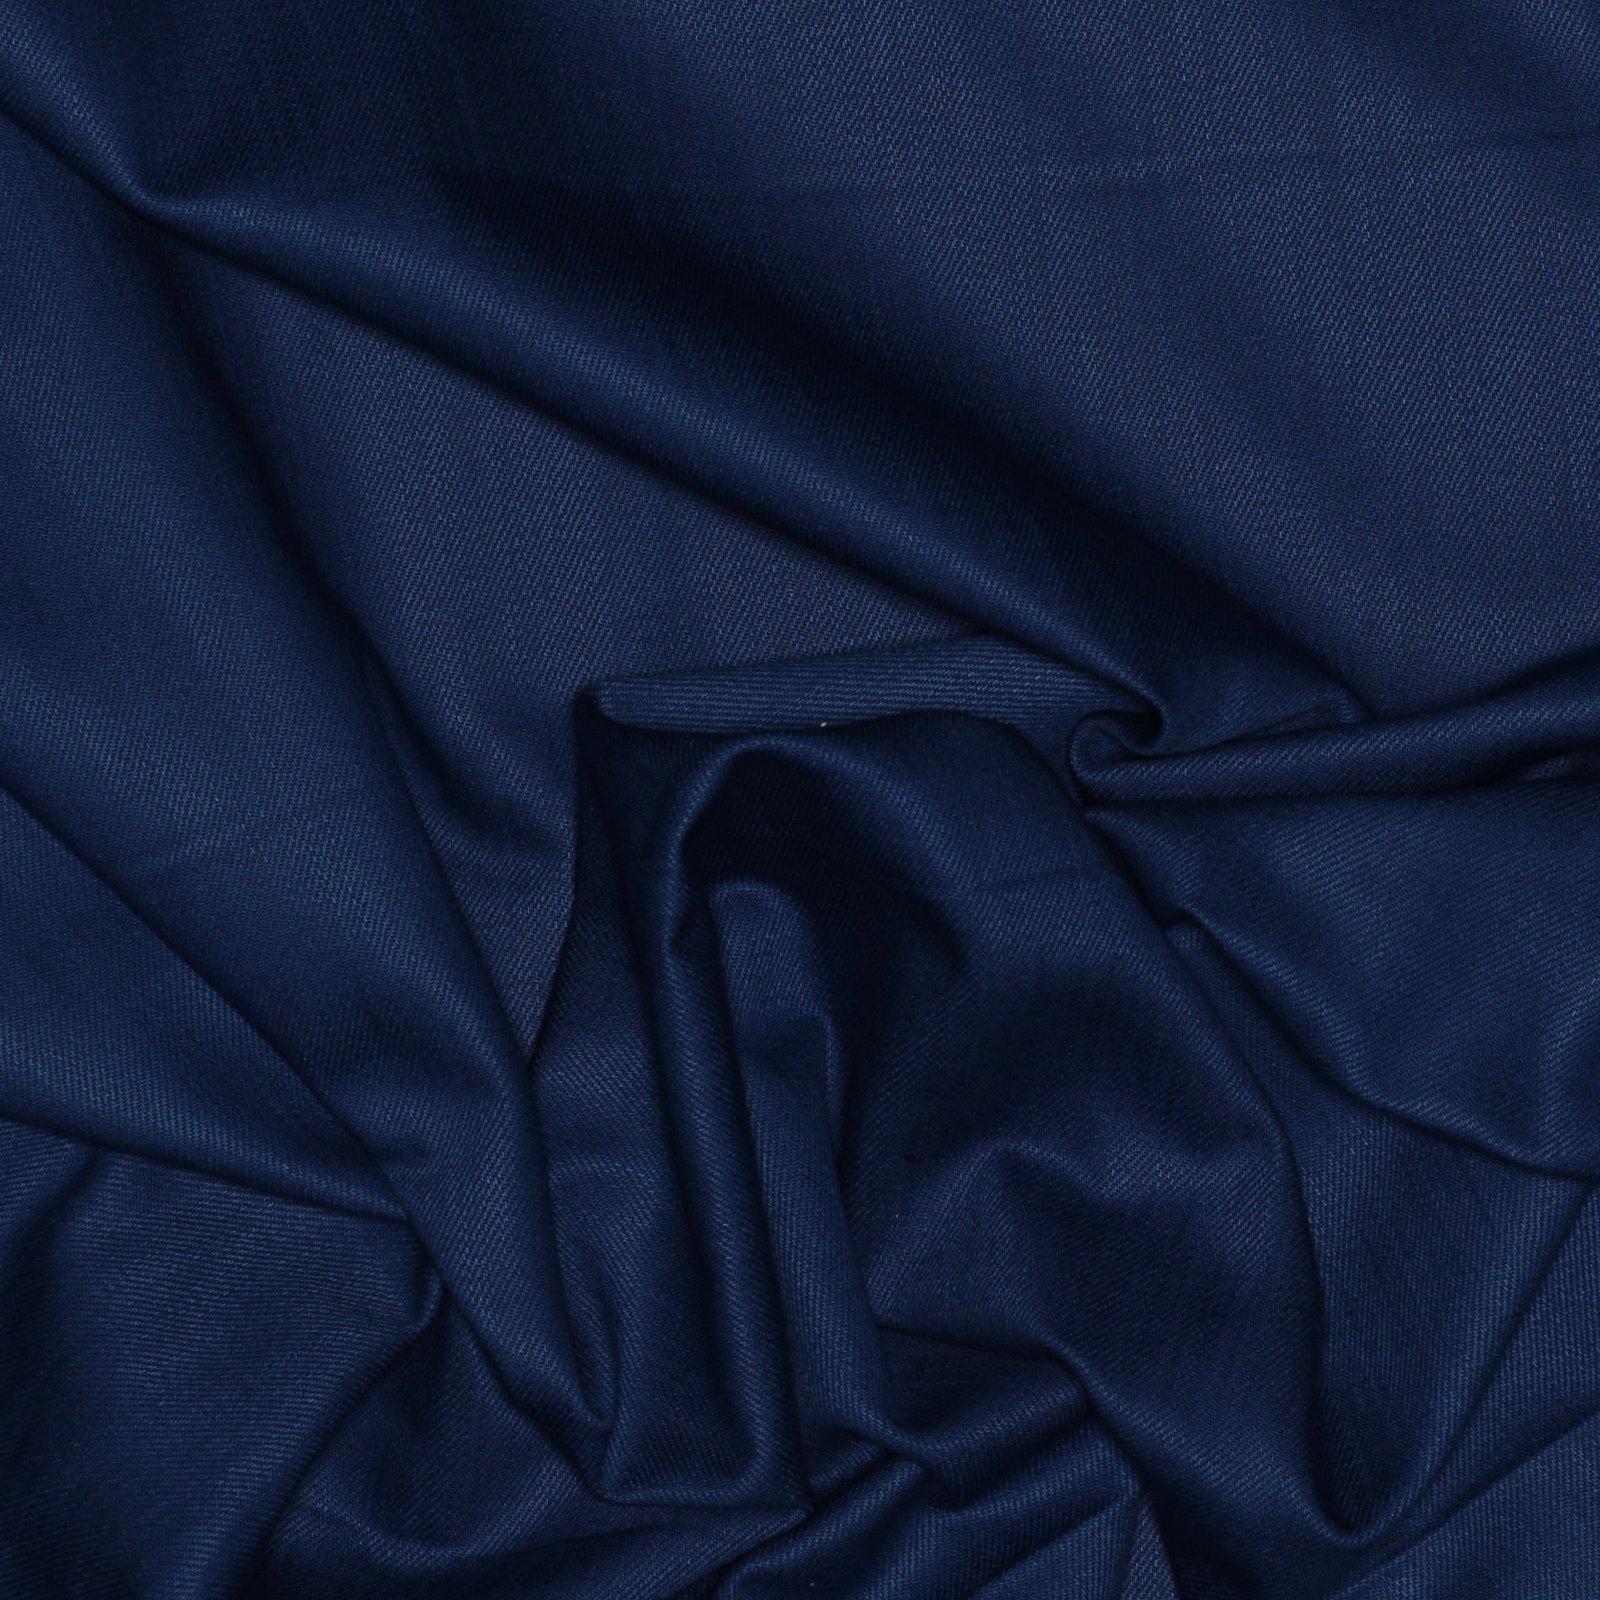 Diesel Blue Cotton Italian Denim